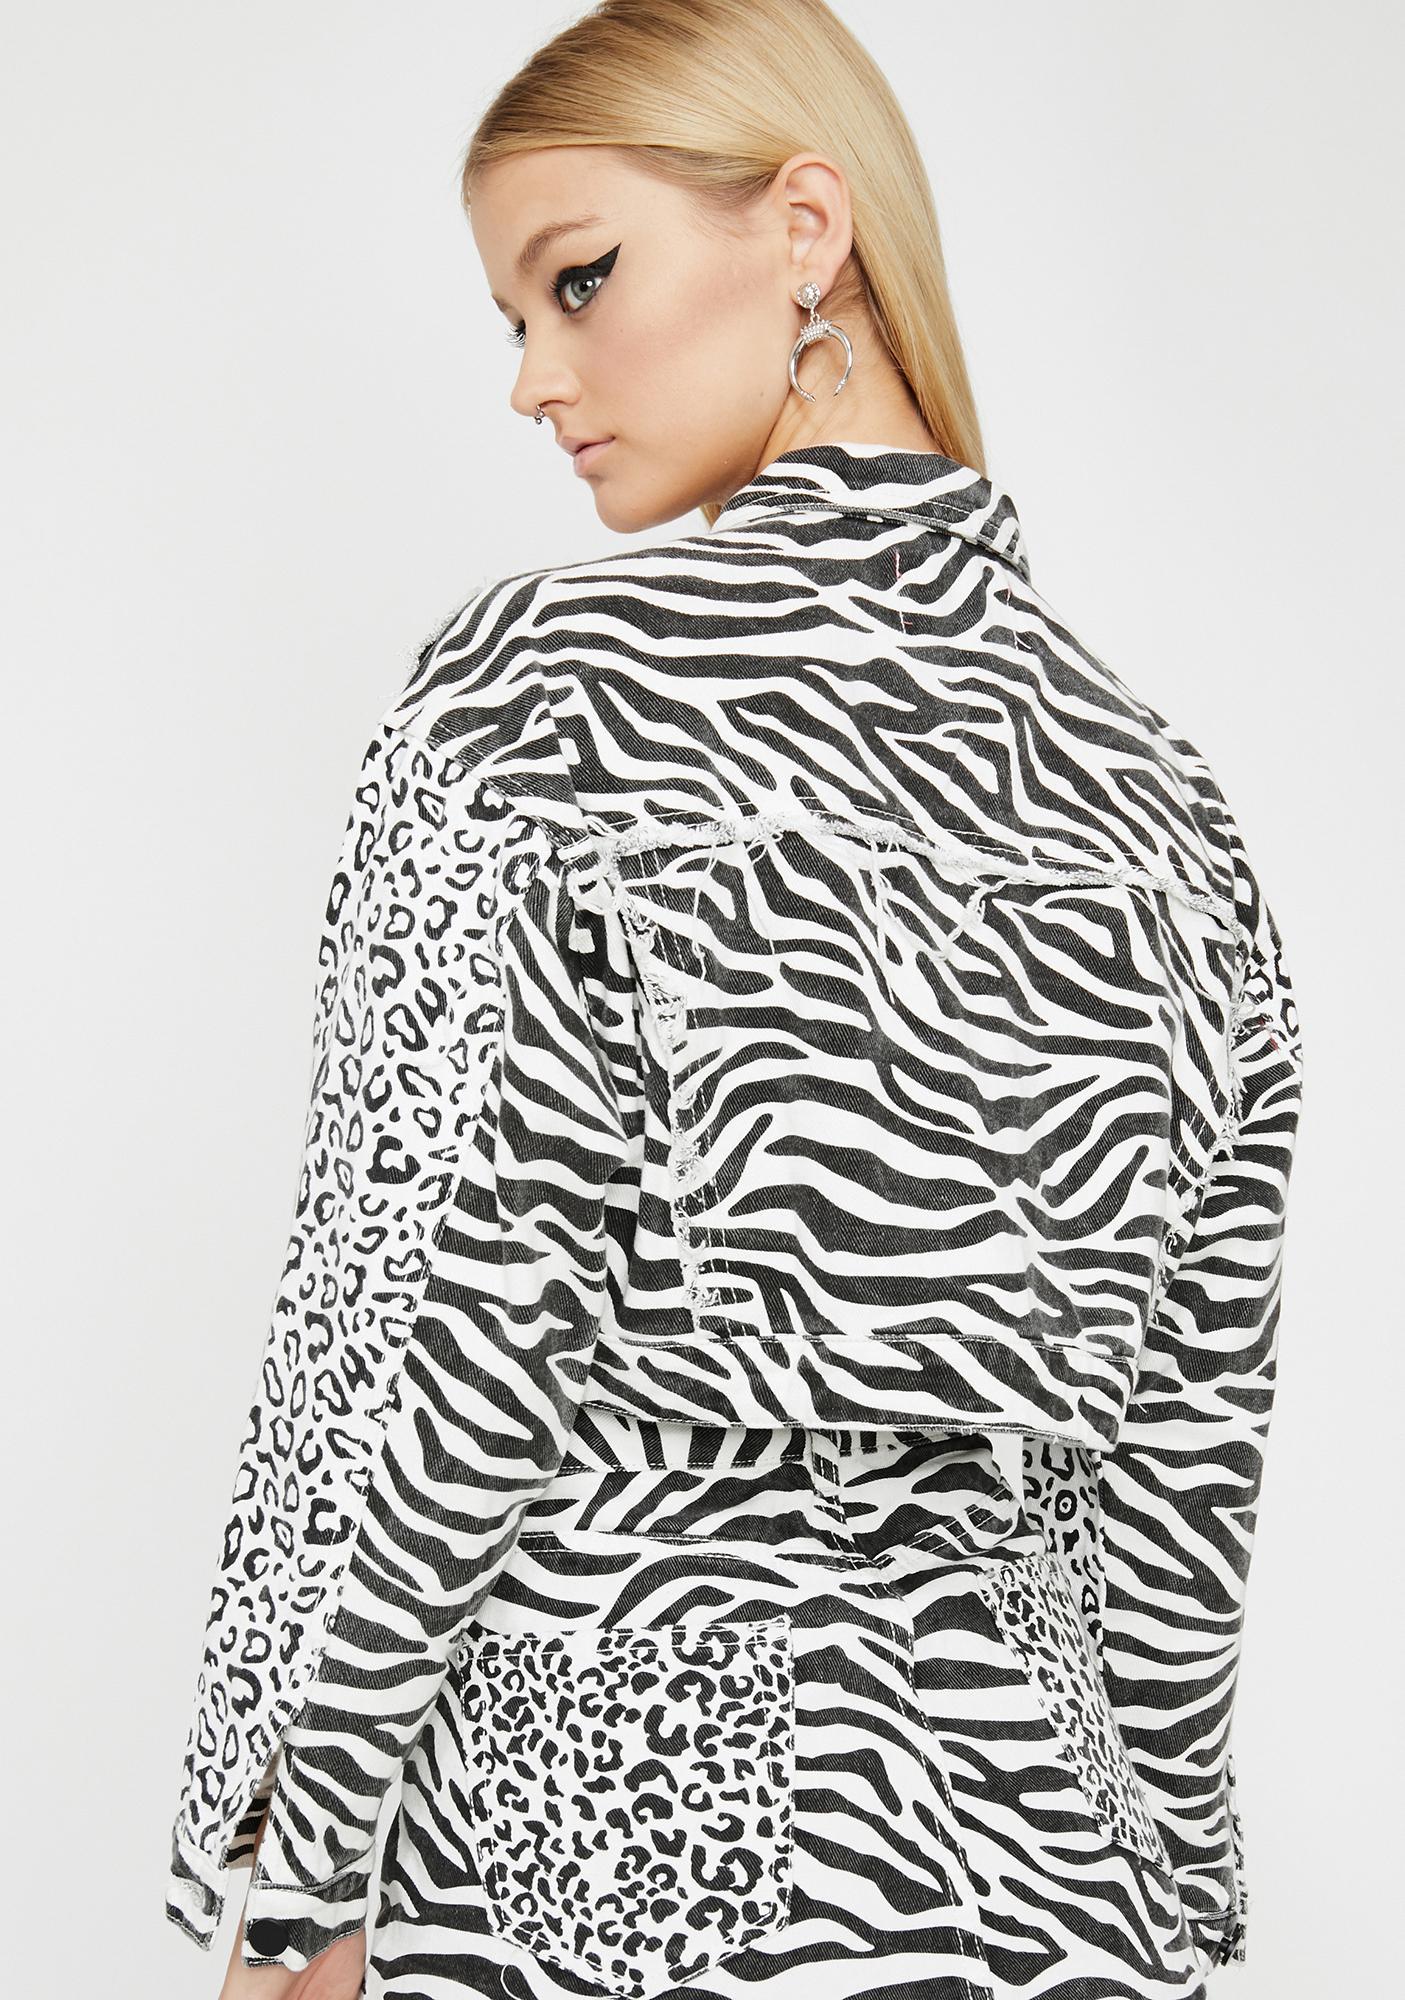 Haute Harlot Denim Jacket